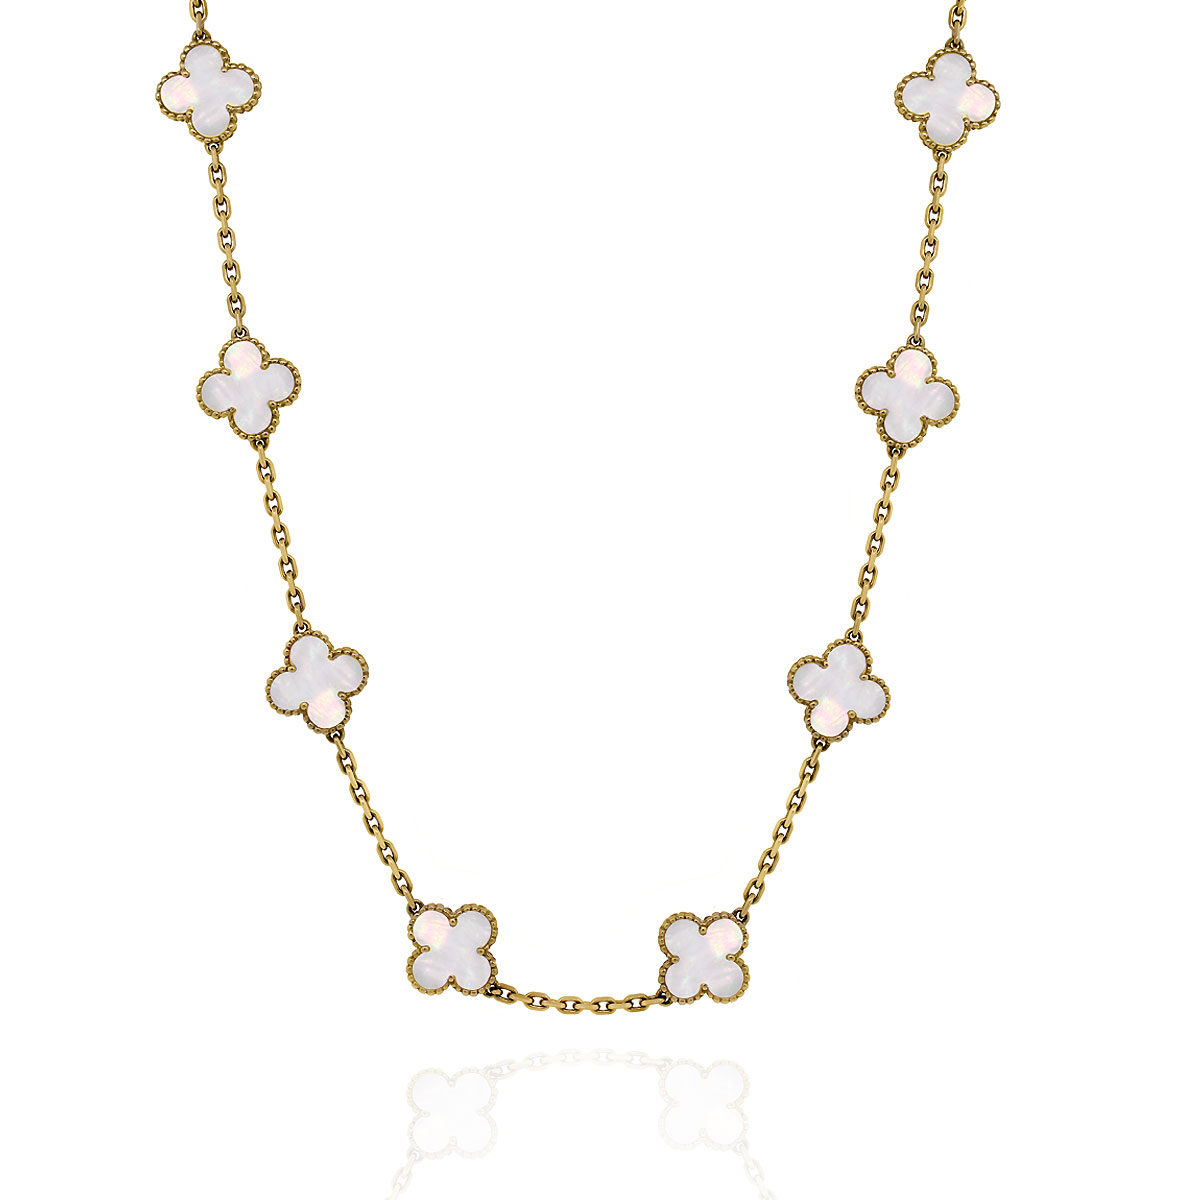 Van Cleef Amp Arpels Alhambra Mother Of Pearl 10 Motif Necklace